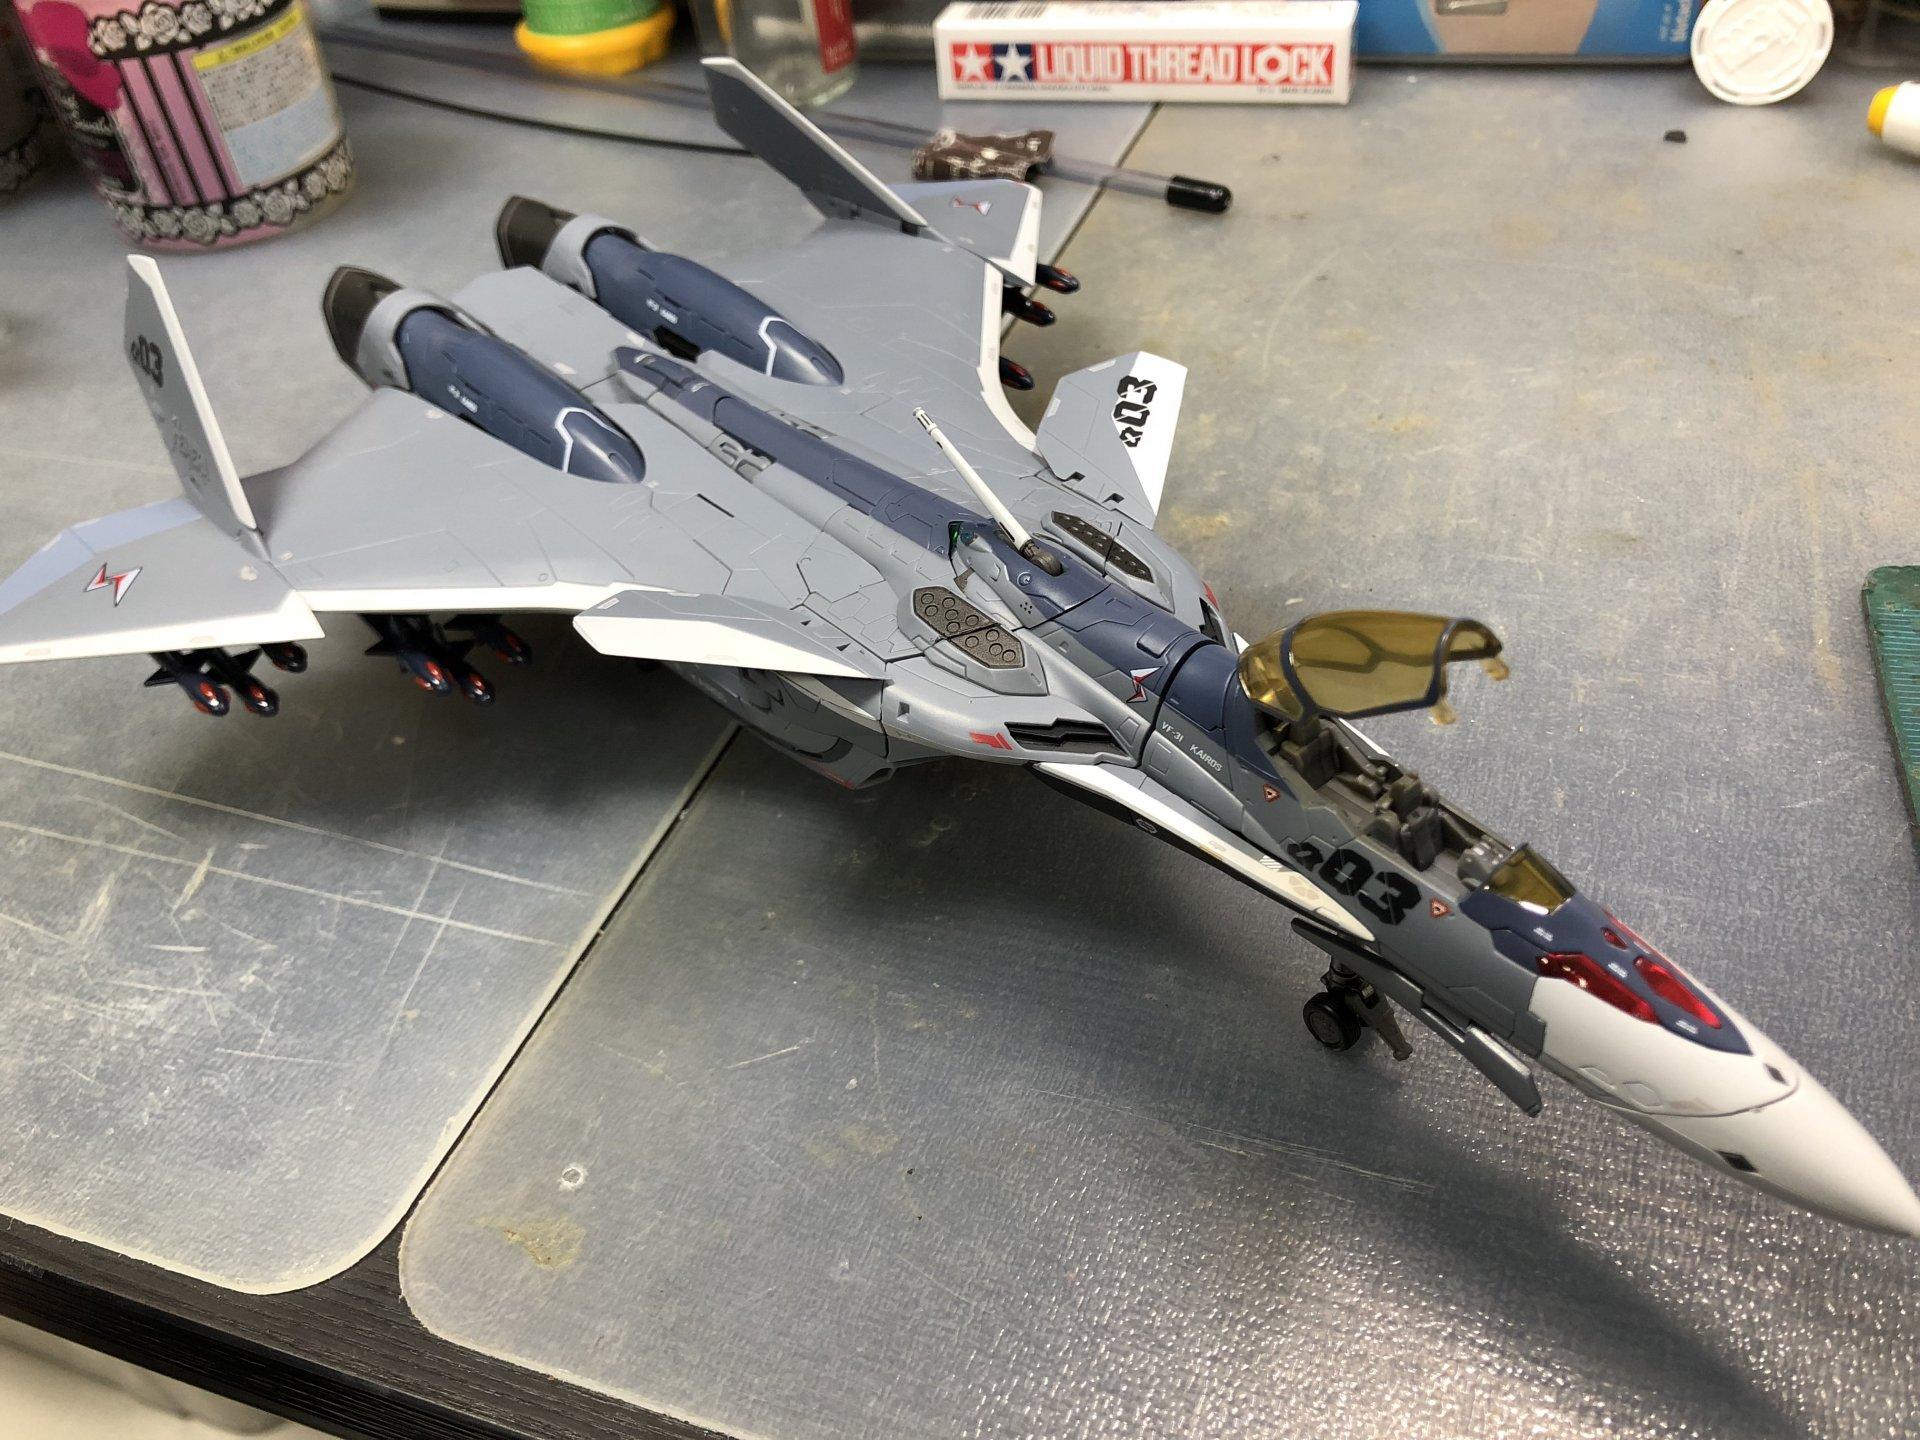 F3EFED85-6090-40AC-928F-491B679414C7.jpeg